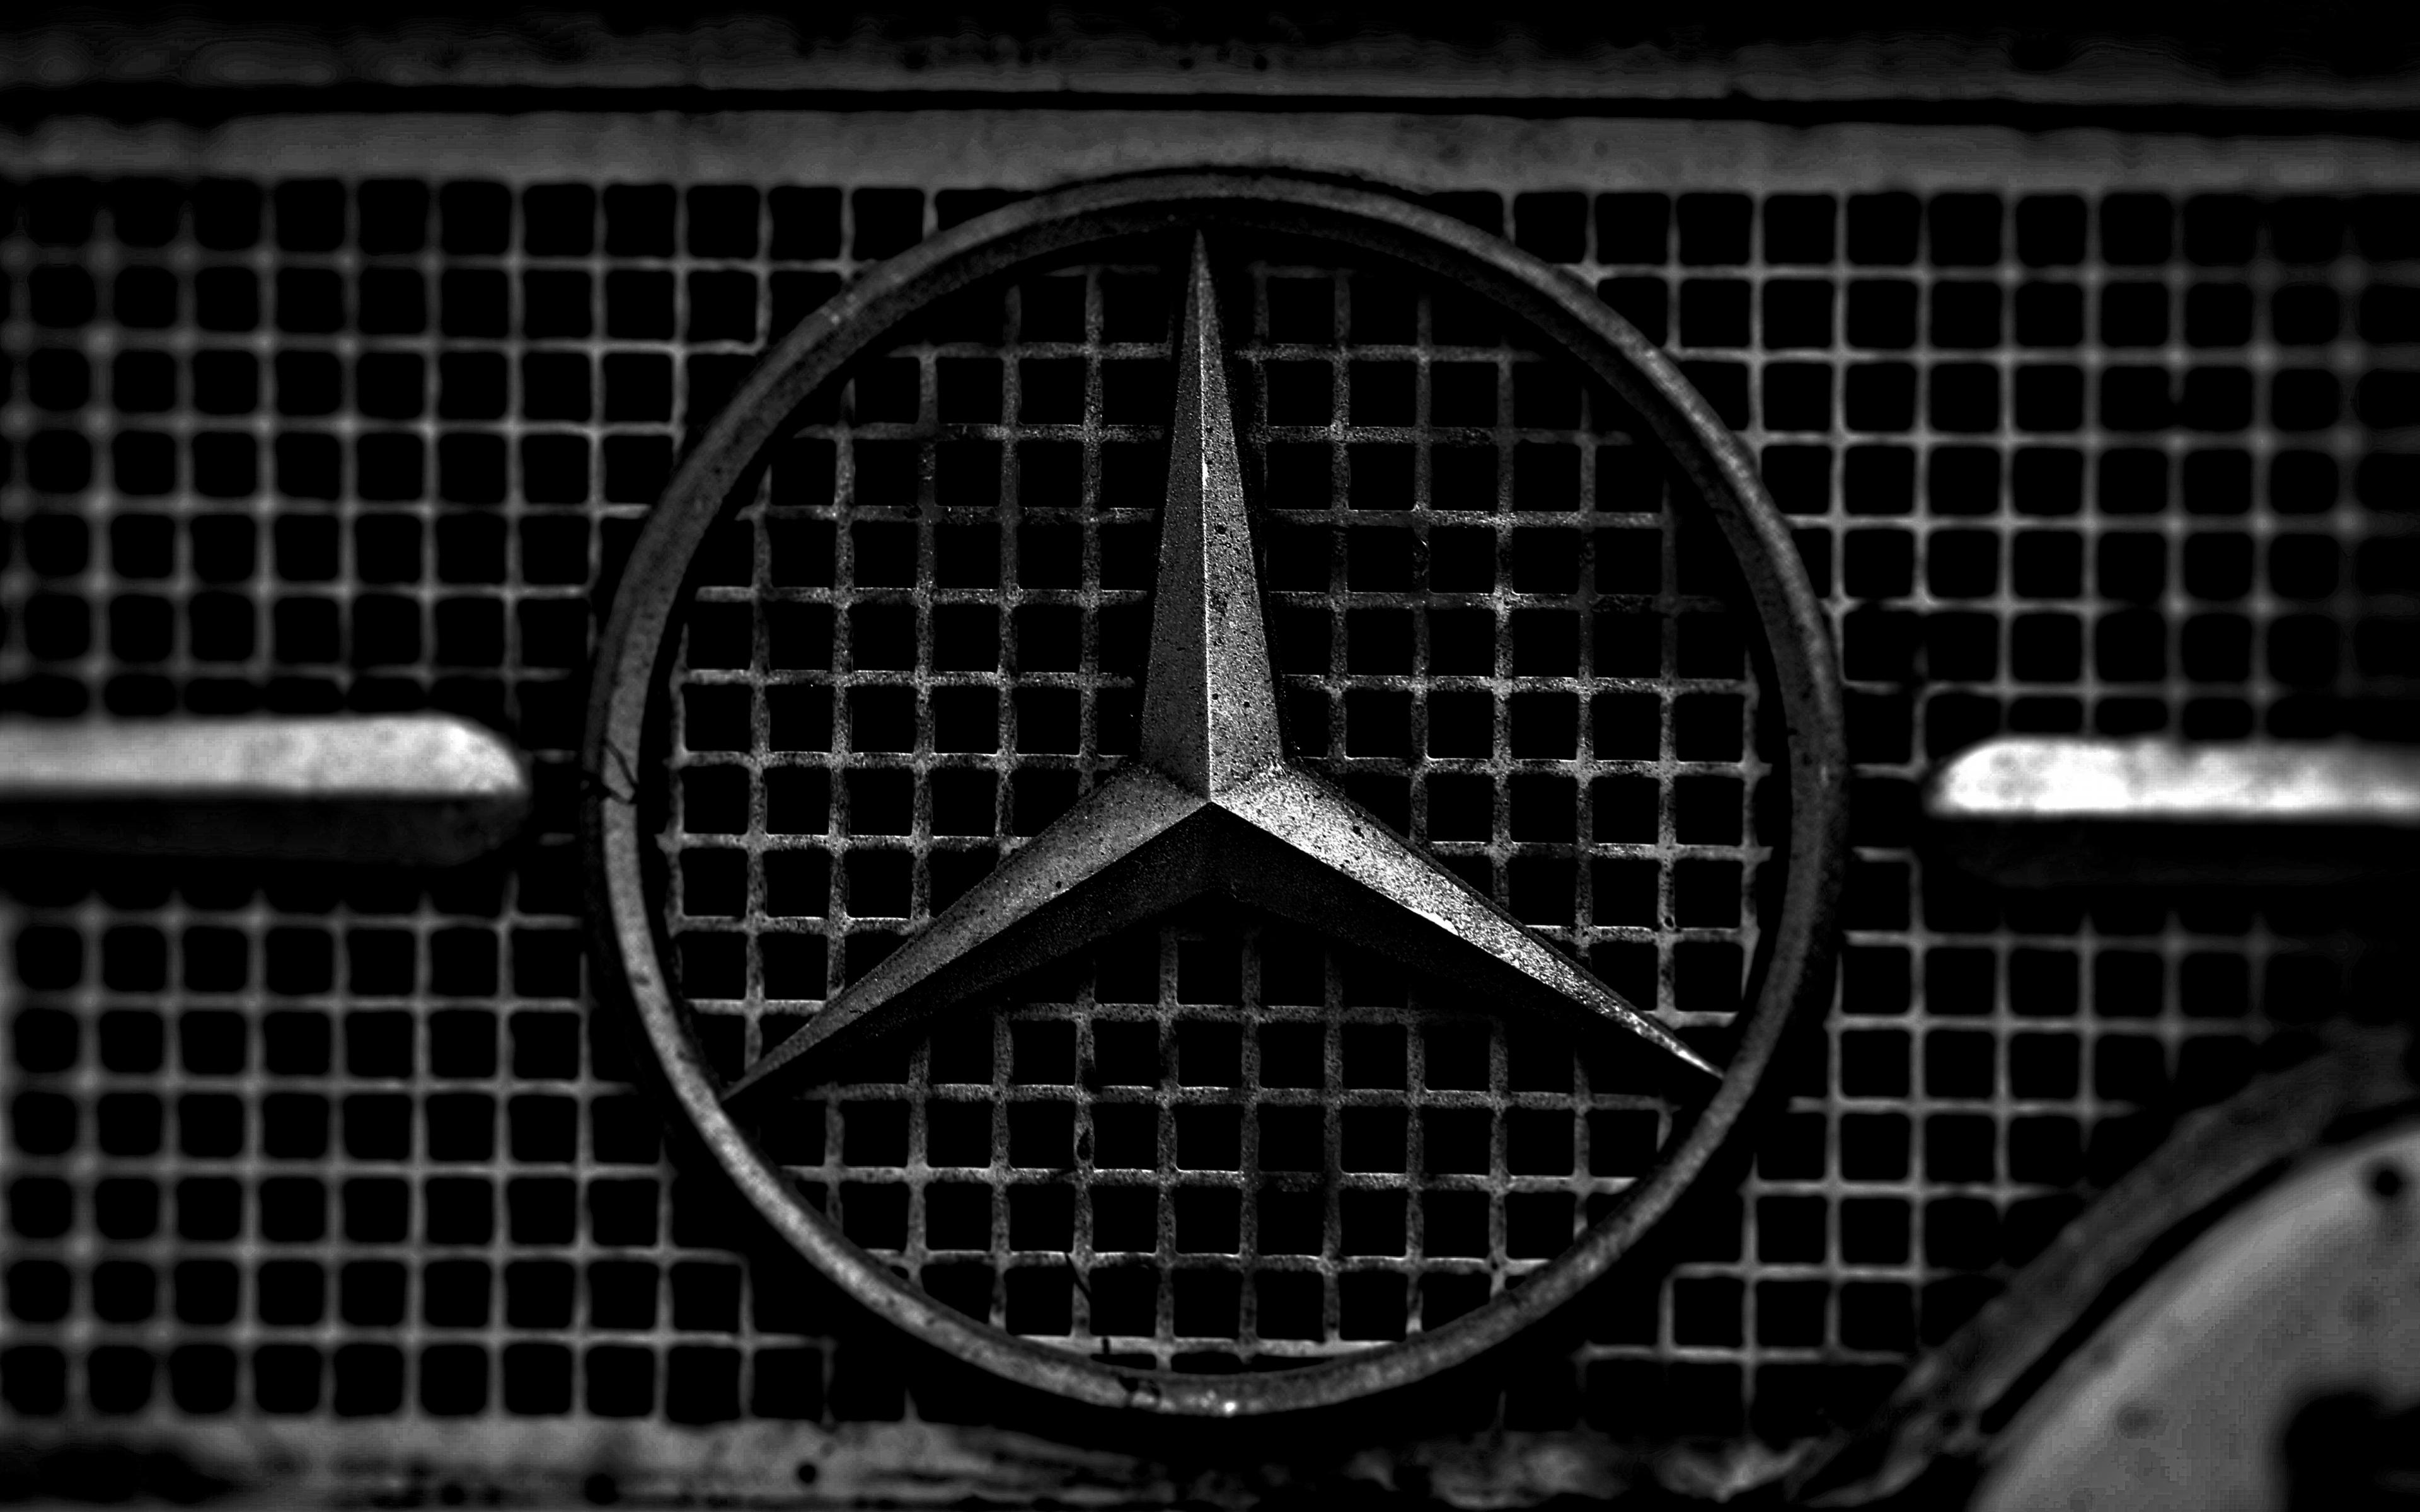 Download 3840x2400 Wallpaper Old Car Mercedes Benz Logo 4k Ultra